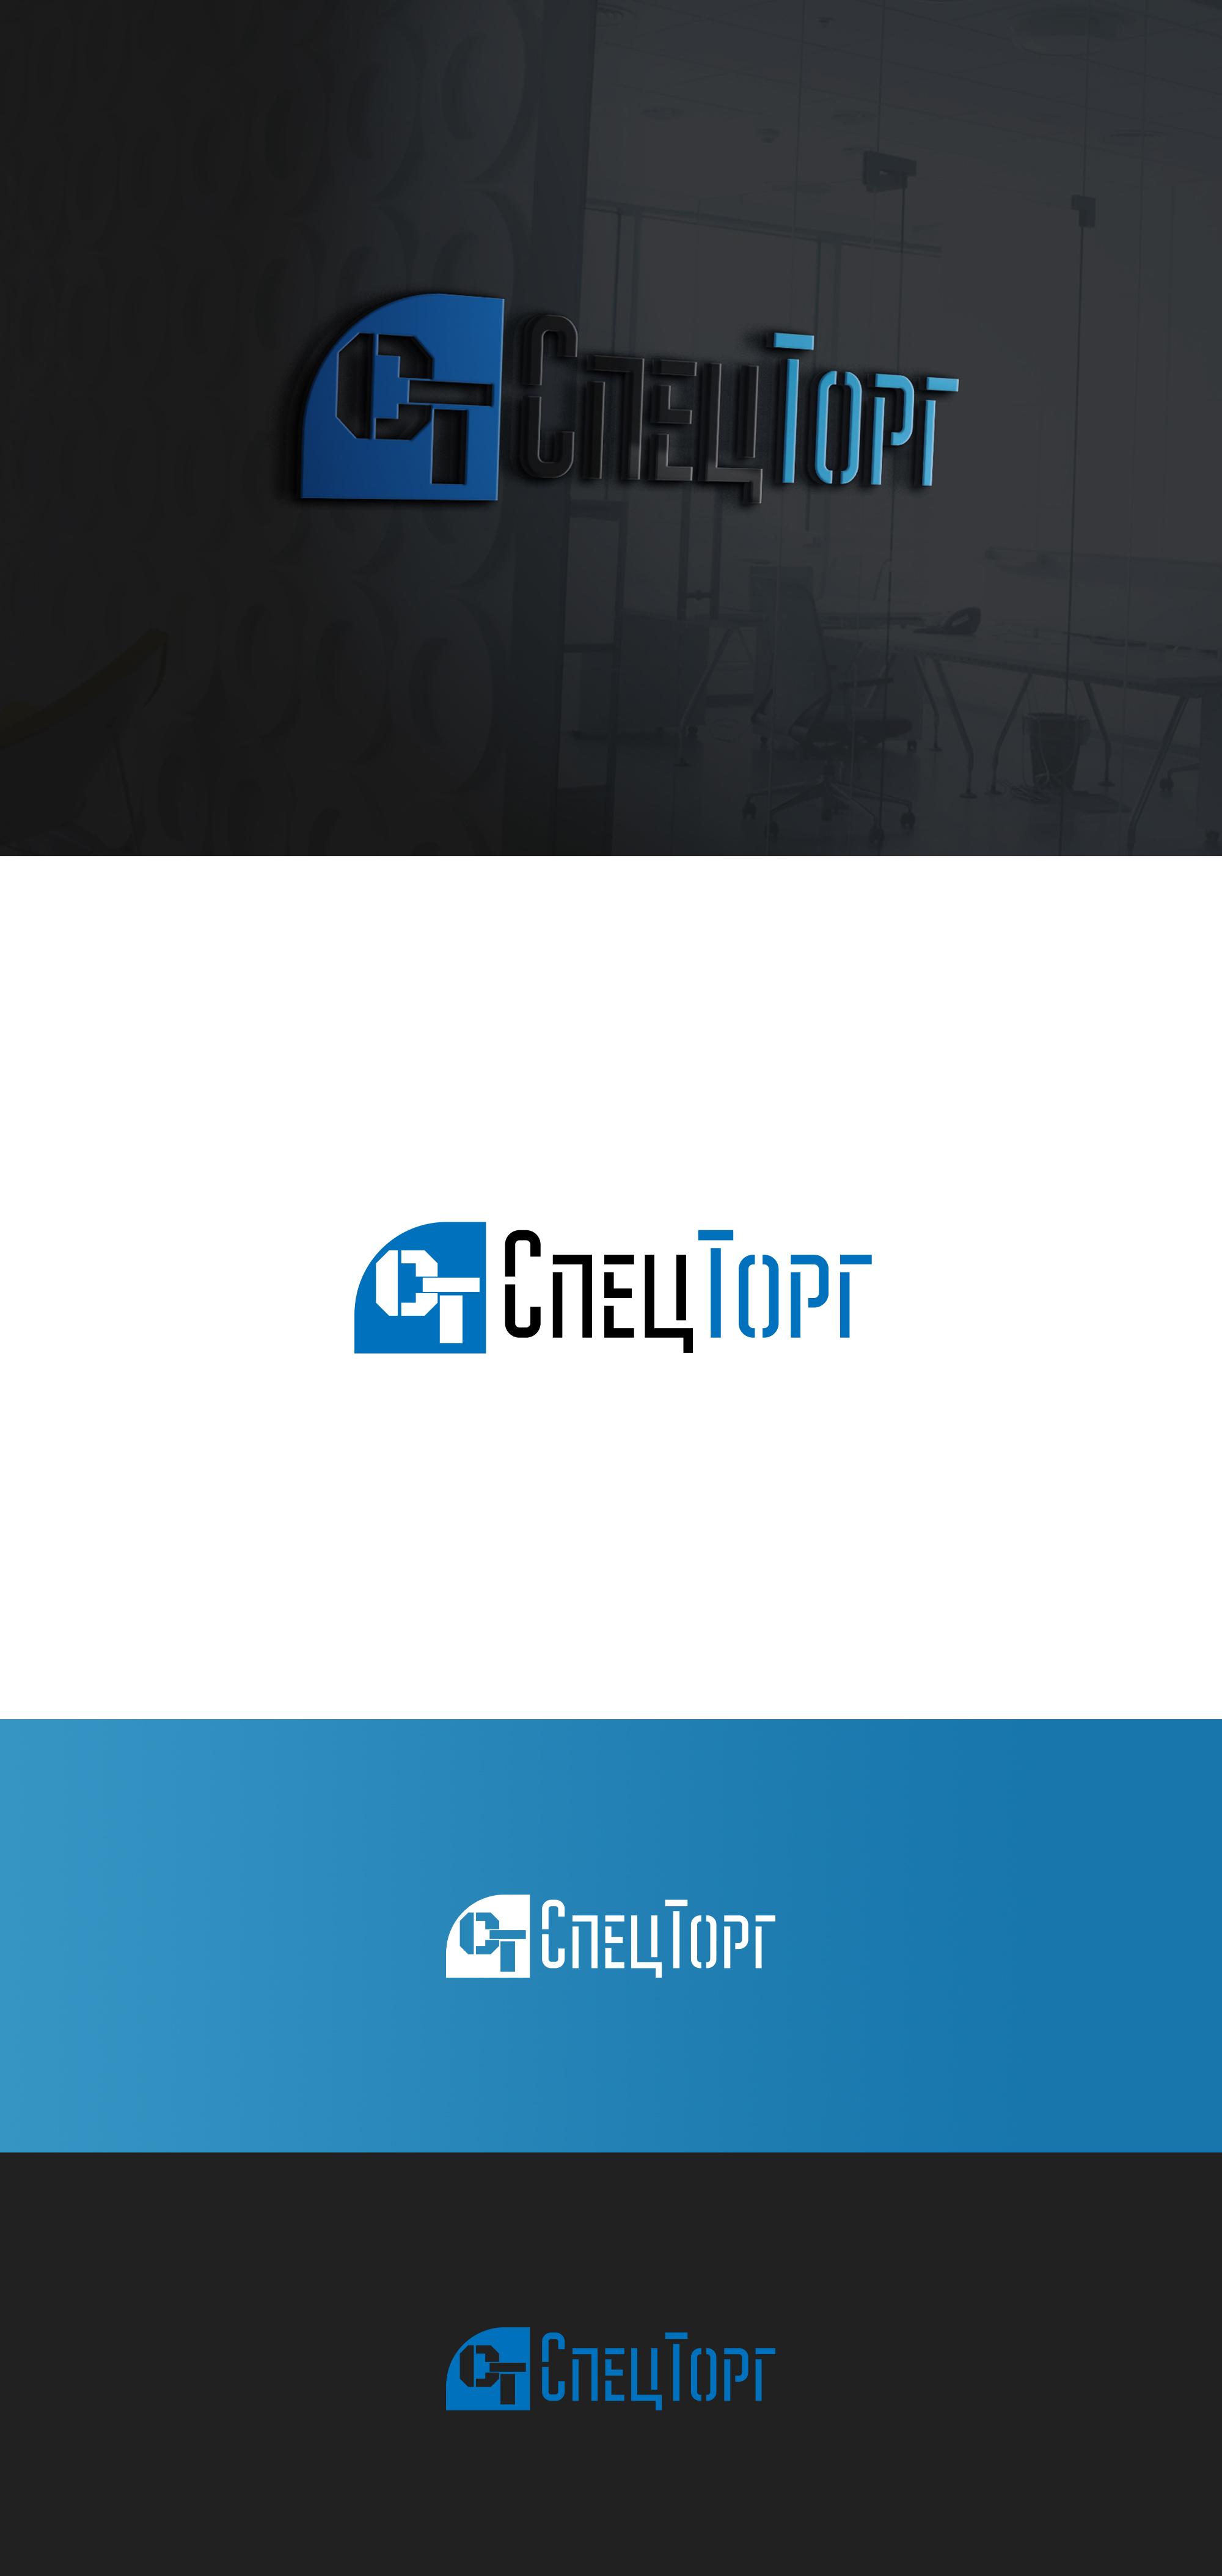 Разработать дизайн  логотипа компании фото f_8335dc305c231c8e.jpg